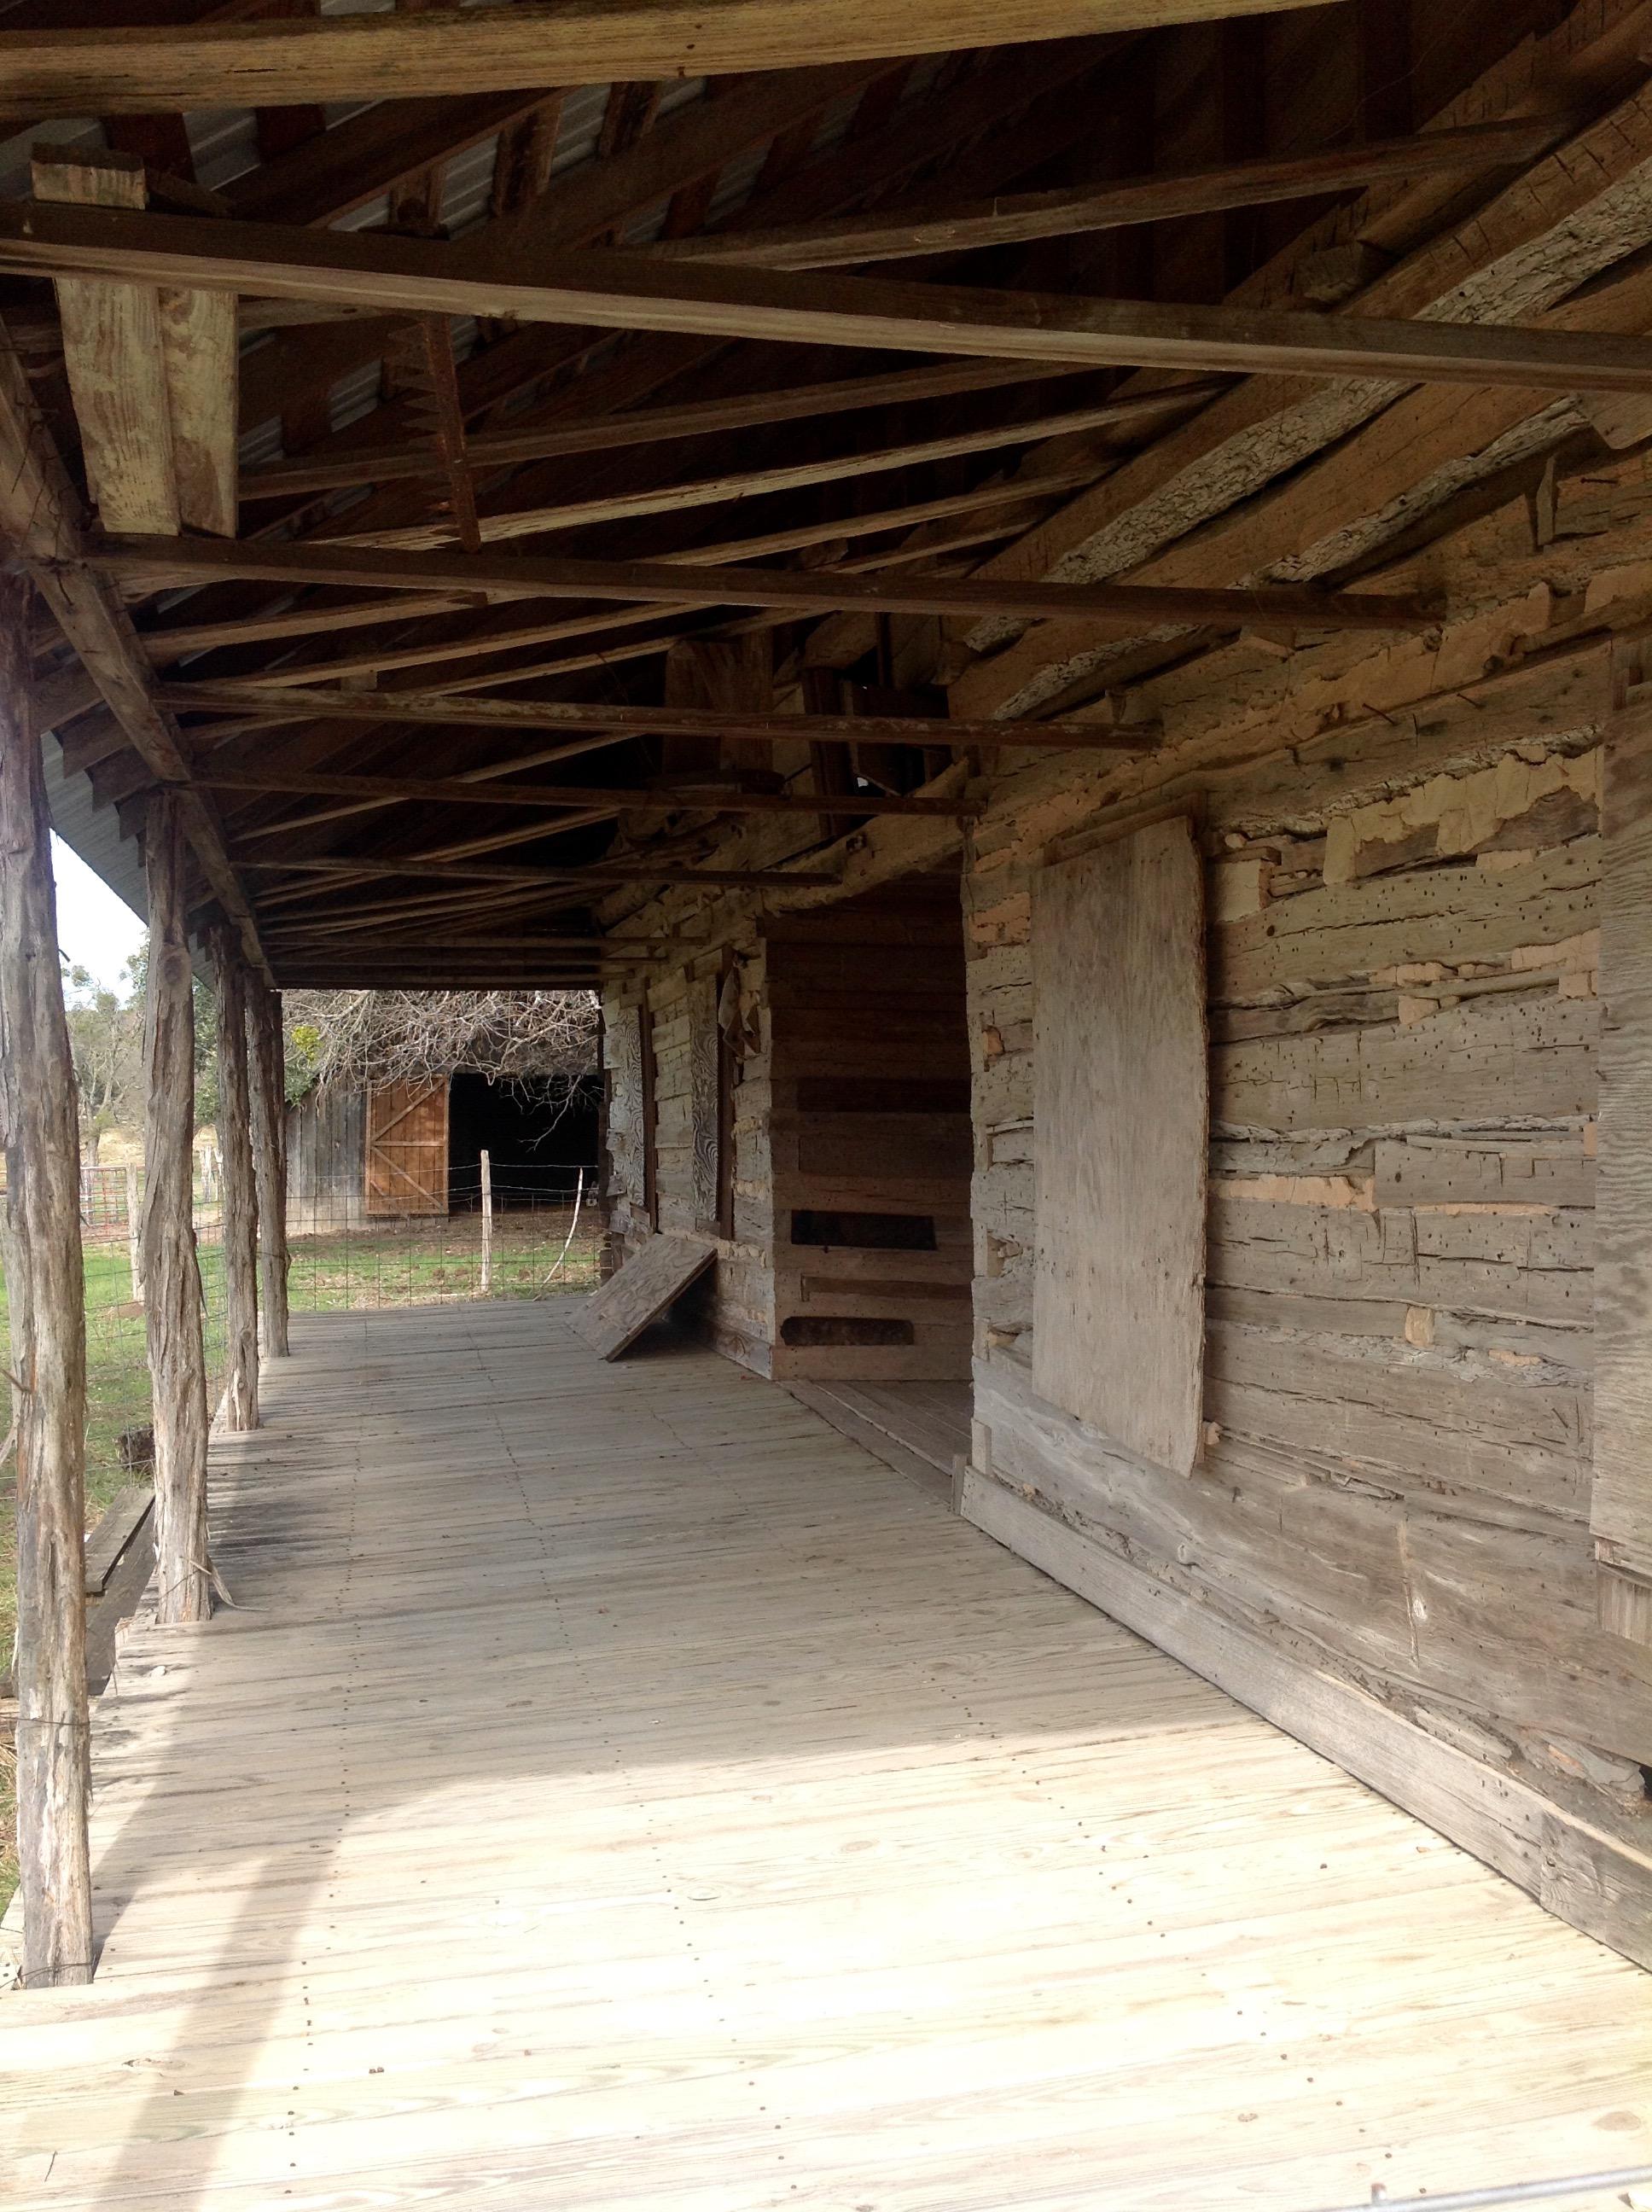 Texas Hill Country Log Cabin. Esat Texas Log Cabin. Texas Farms and Ranches. Texas Ranch Log Home Design. Farm and Ranch Home Design. Farm and Ranch Home Style. Farm and Ranch Home Architecture. Rustic Log Cabin Texas, Colorado, Oklahoma Architect Architecture Firm